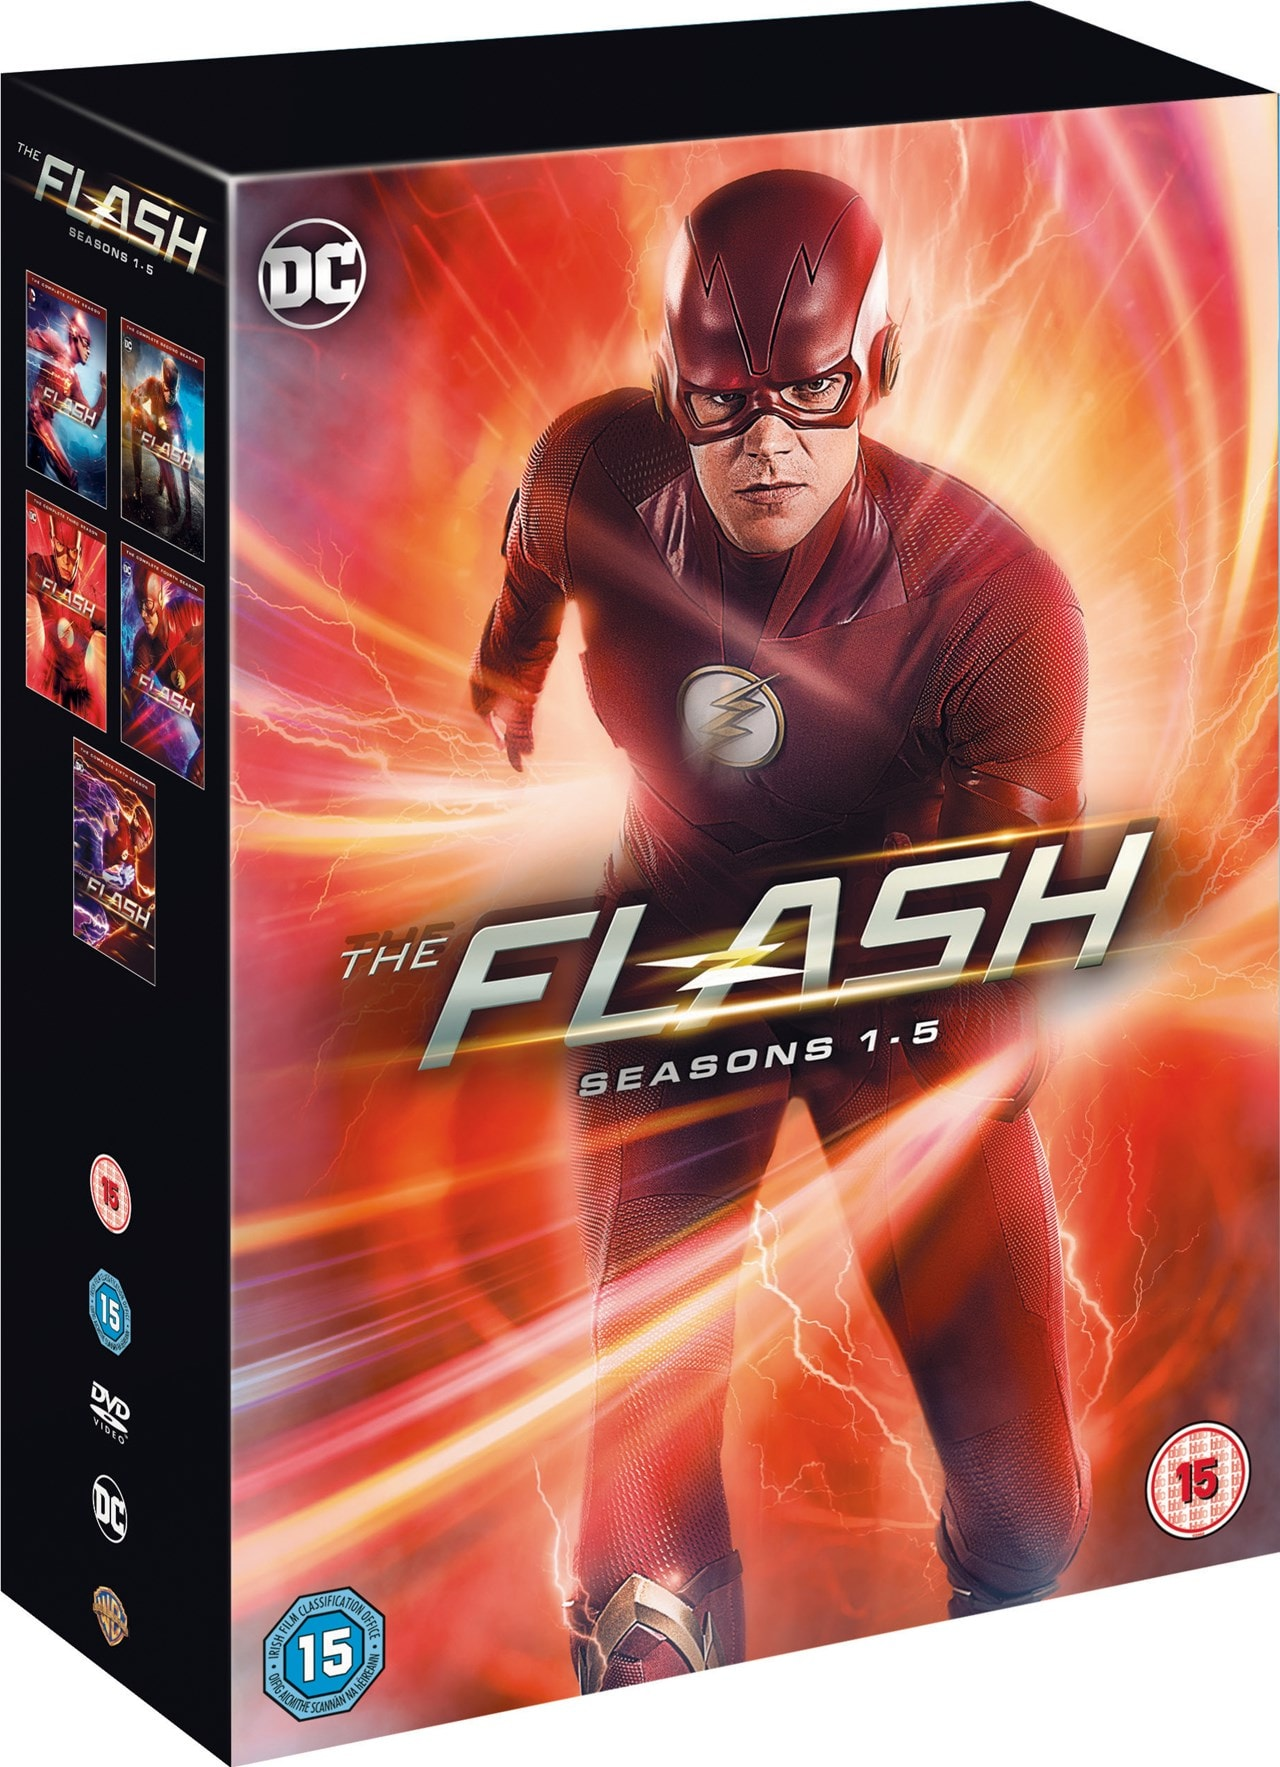 The Flash: Seasons 1-5 - 2